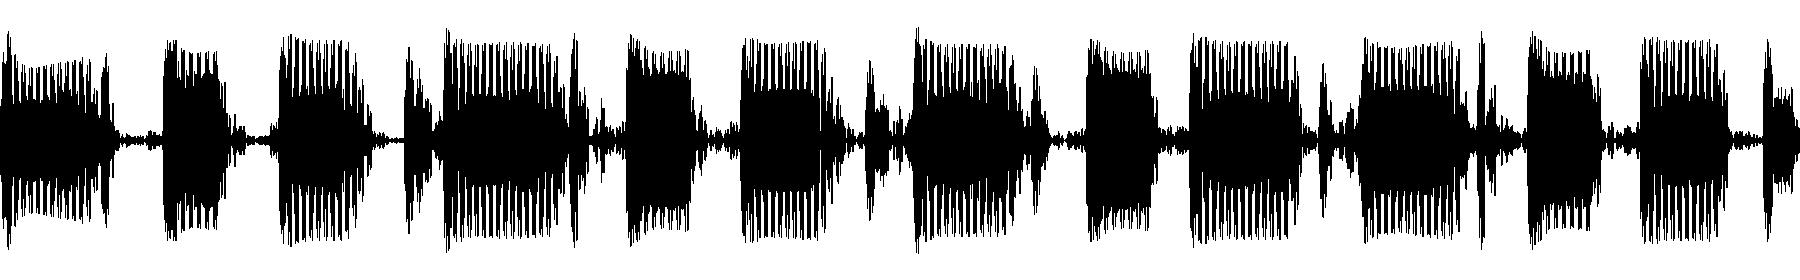 ab oldenbass118b 02